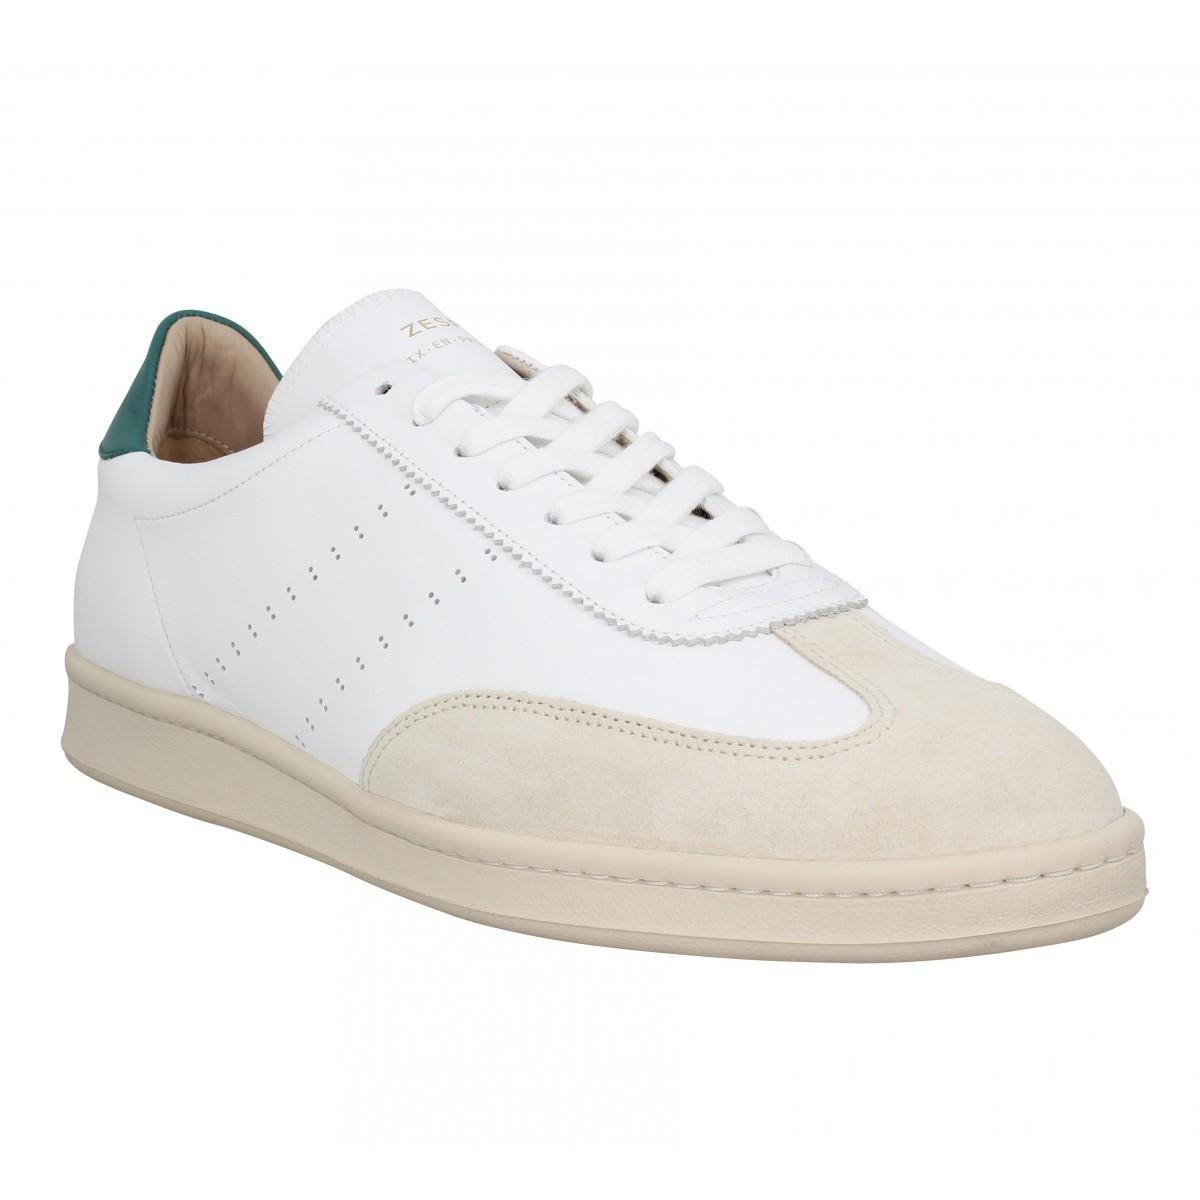 Zespa Homme Zspgt Cuir -40-blanc Cypres